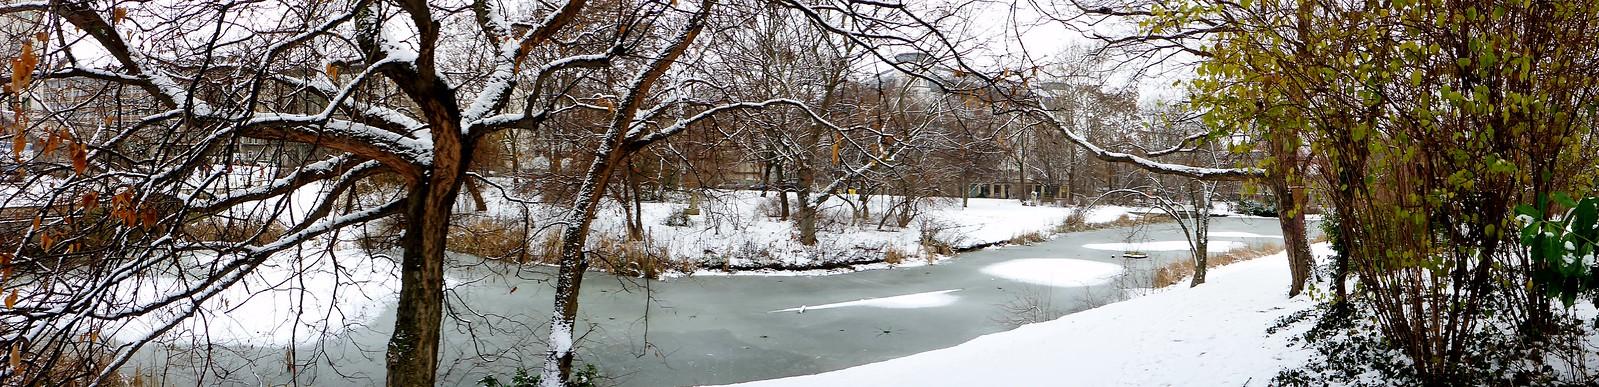 2.1.2017 - Schnee in Leipzig